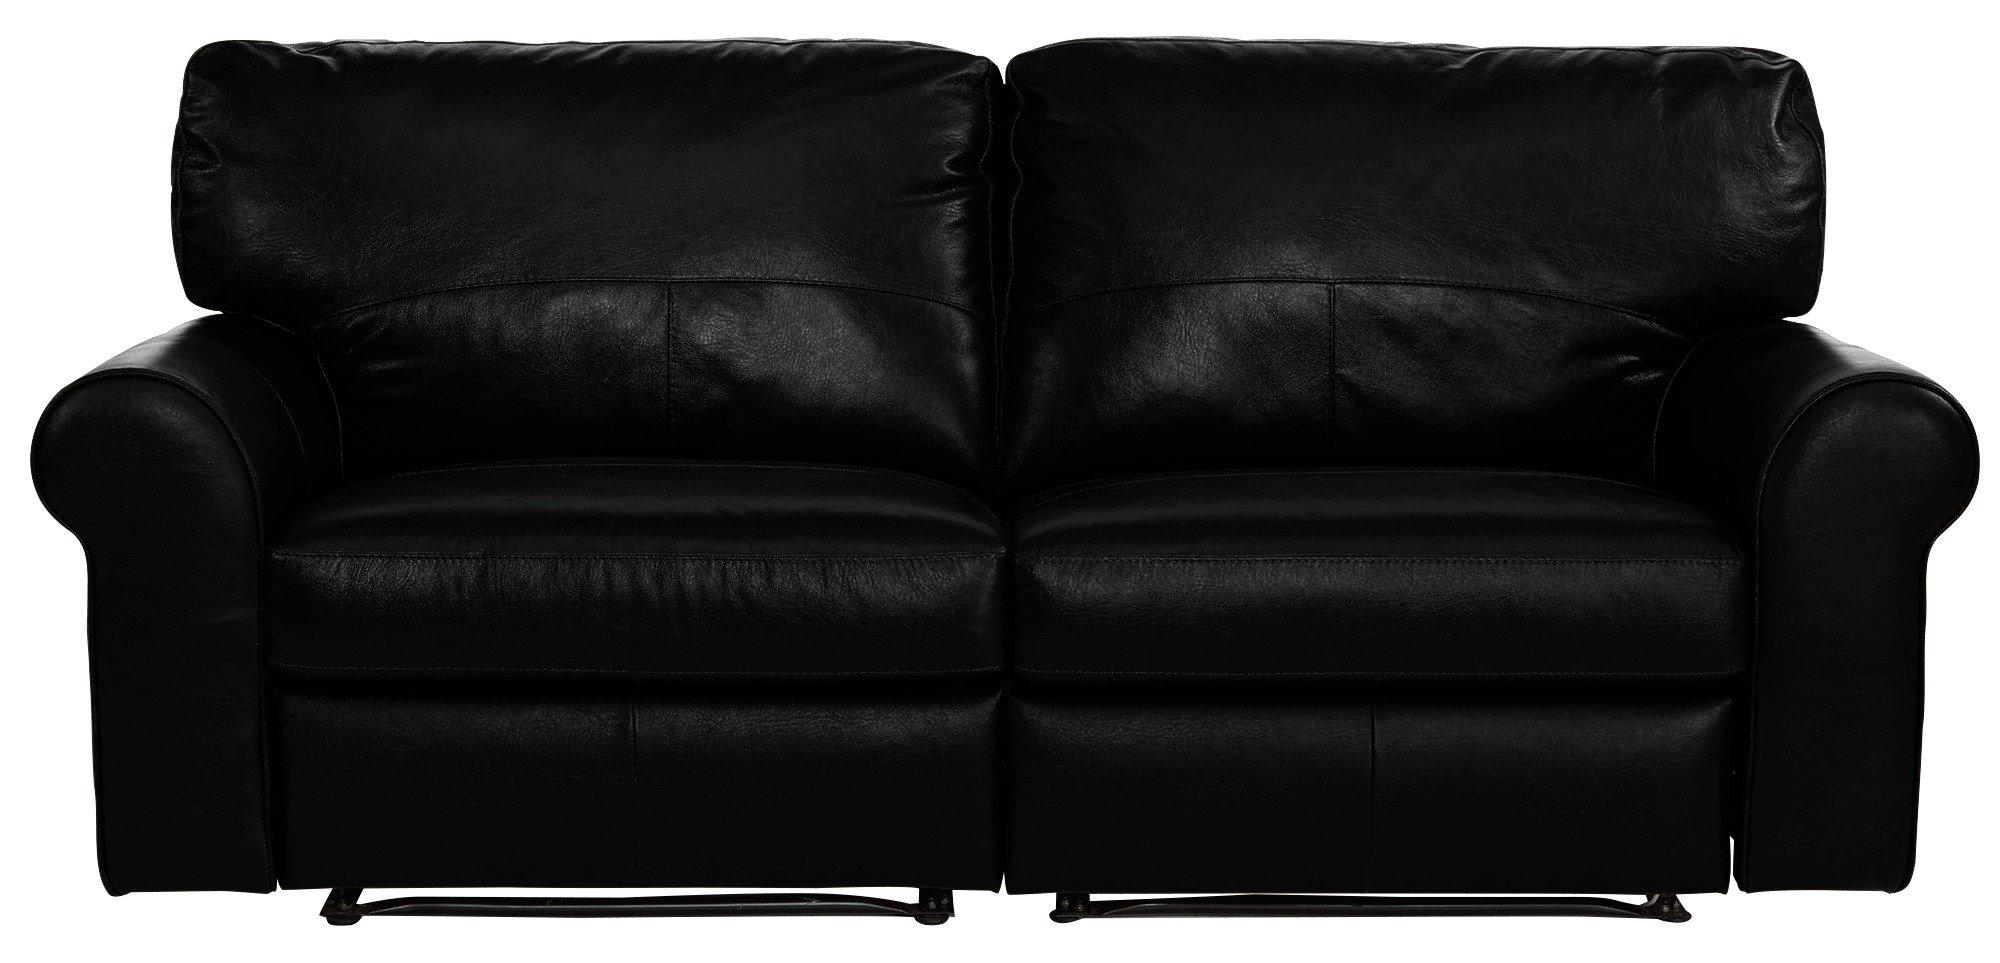 Argos Home -  Salisbury 3 Seater Recliner Sofa - Black